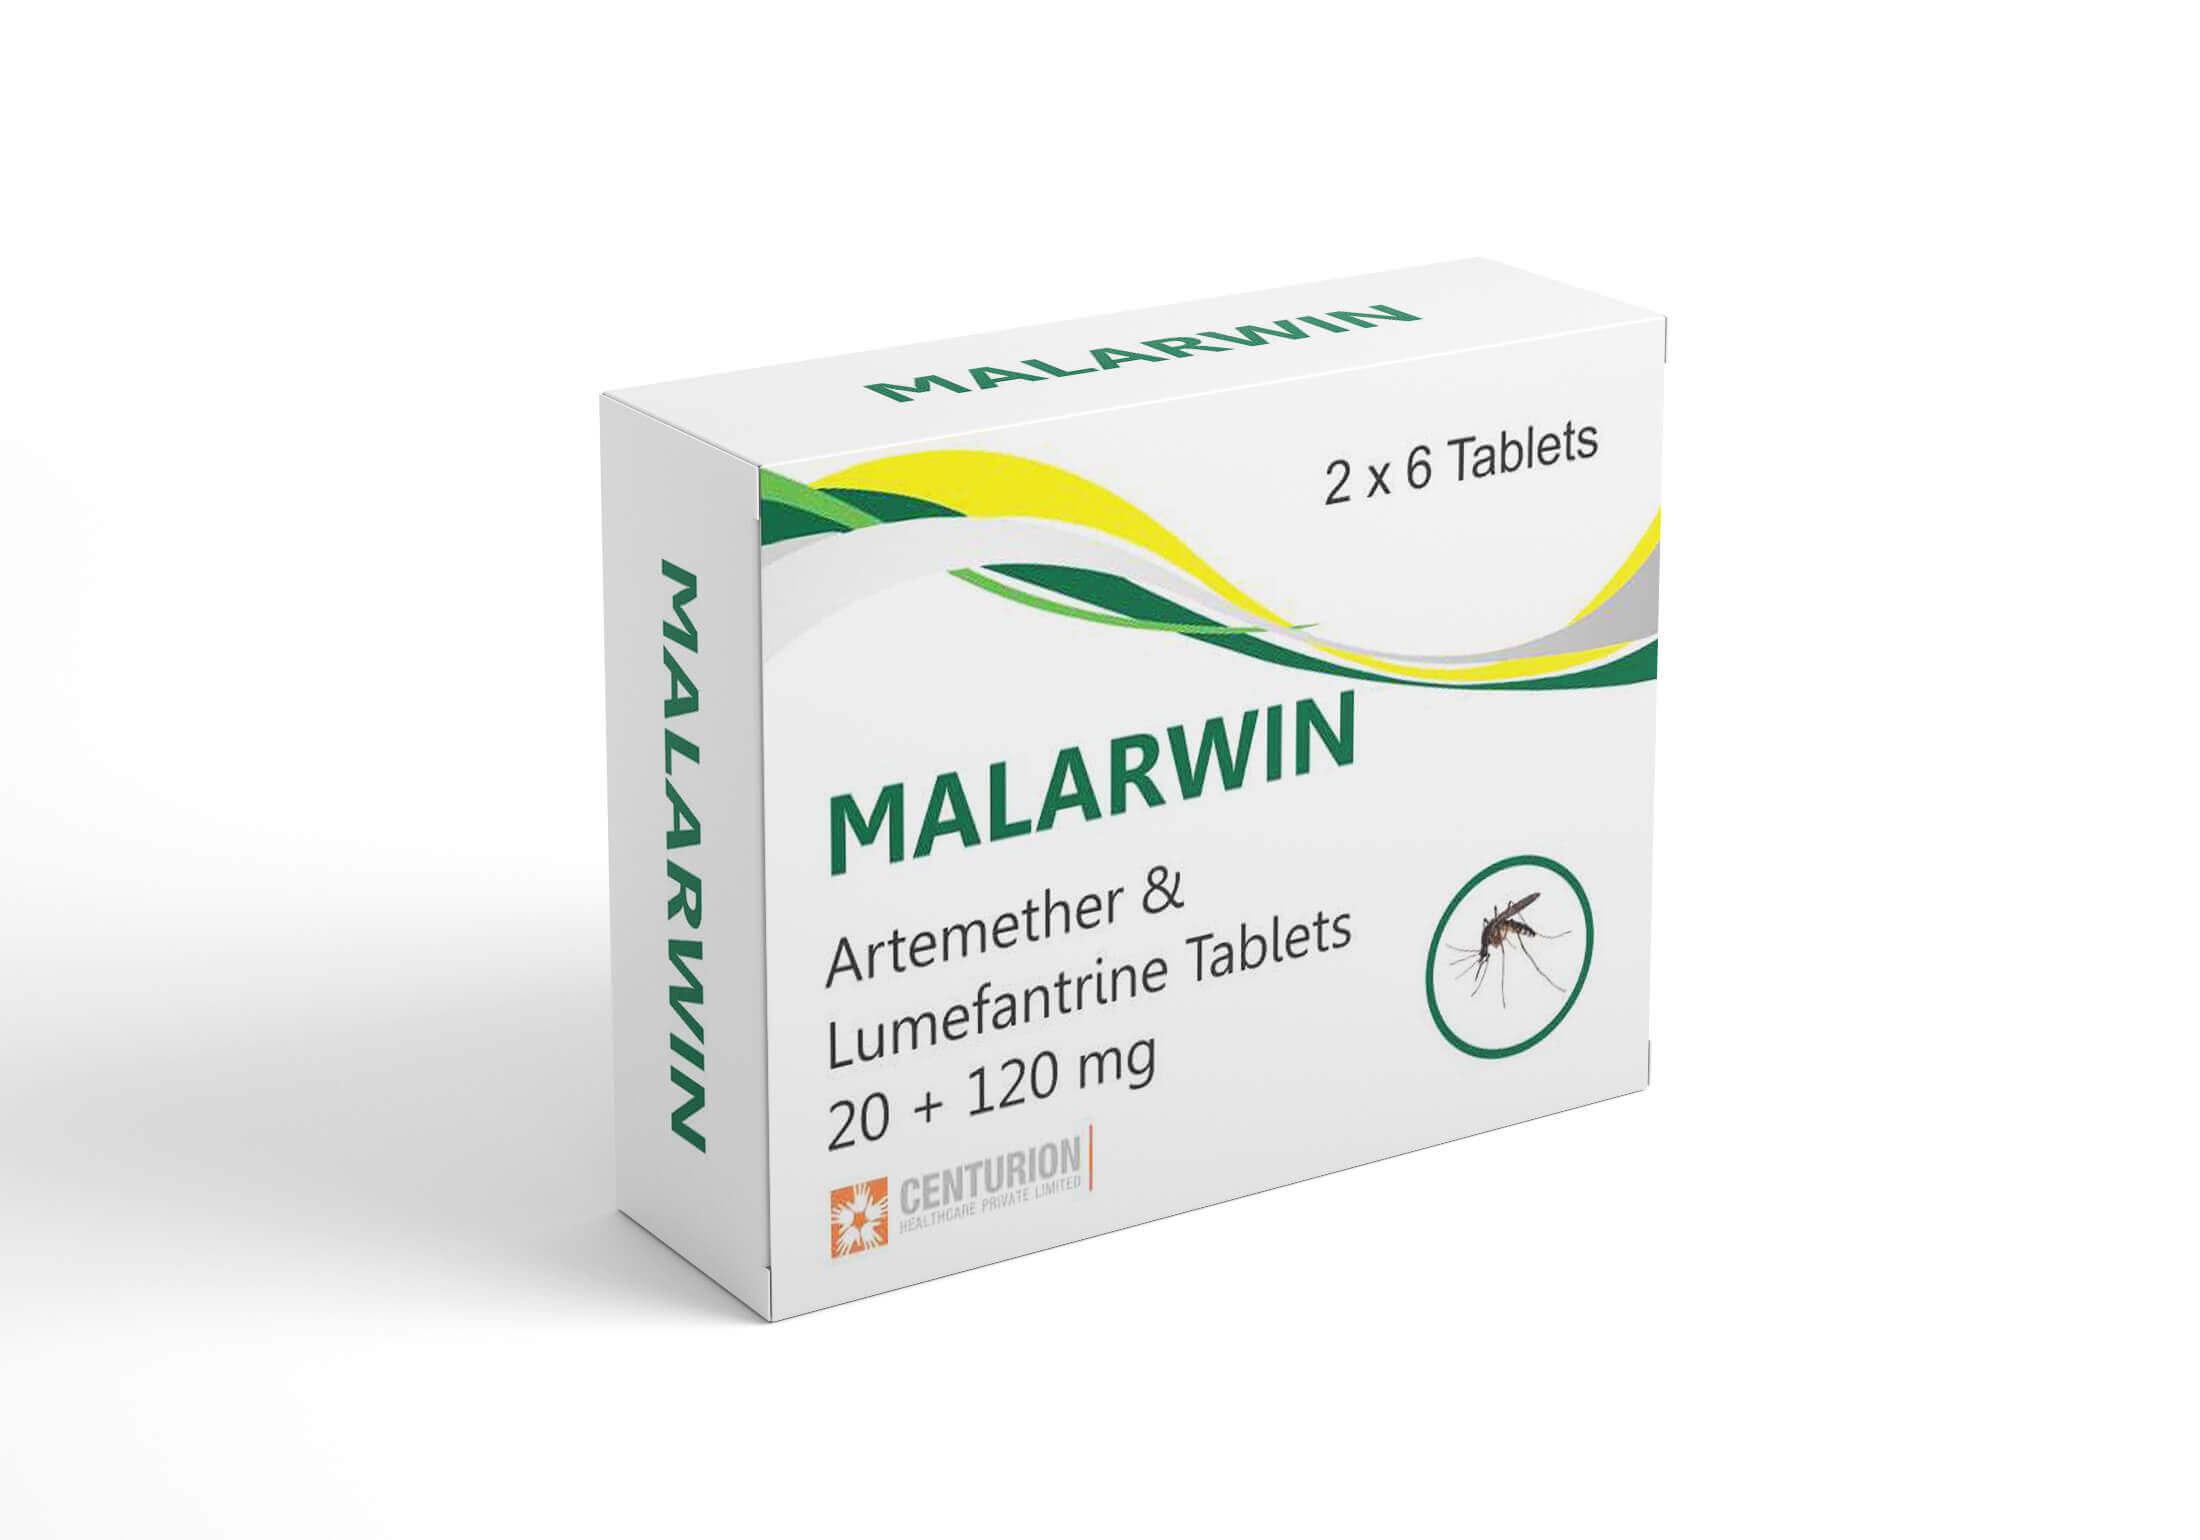 Malarwin Tablets